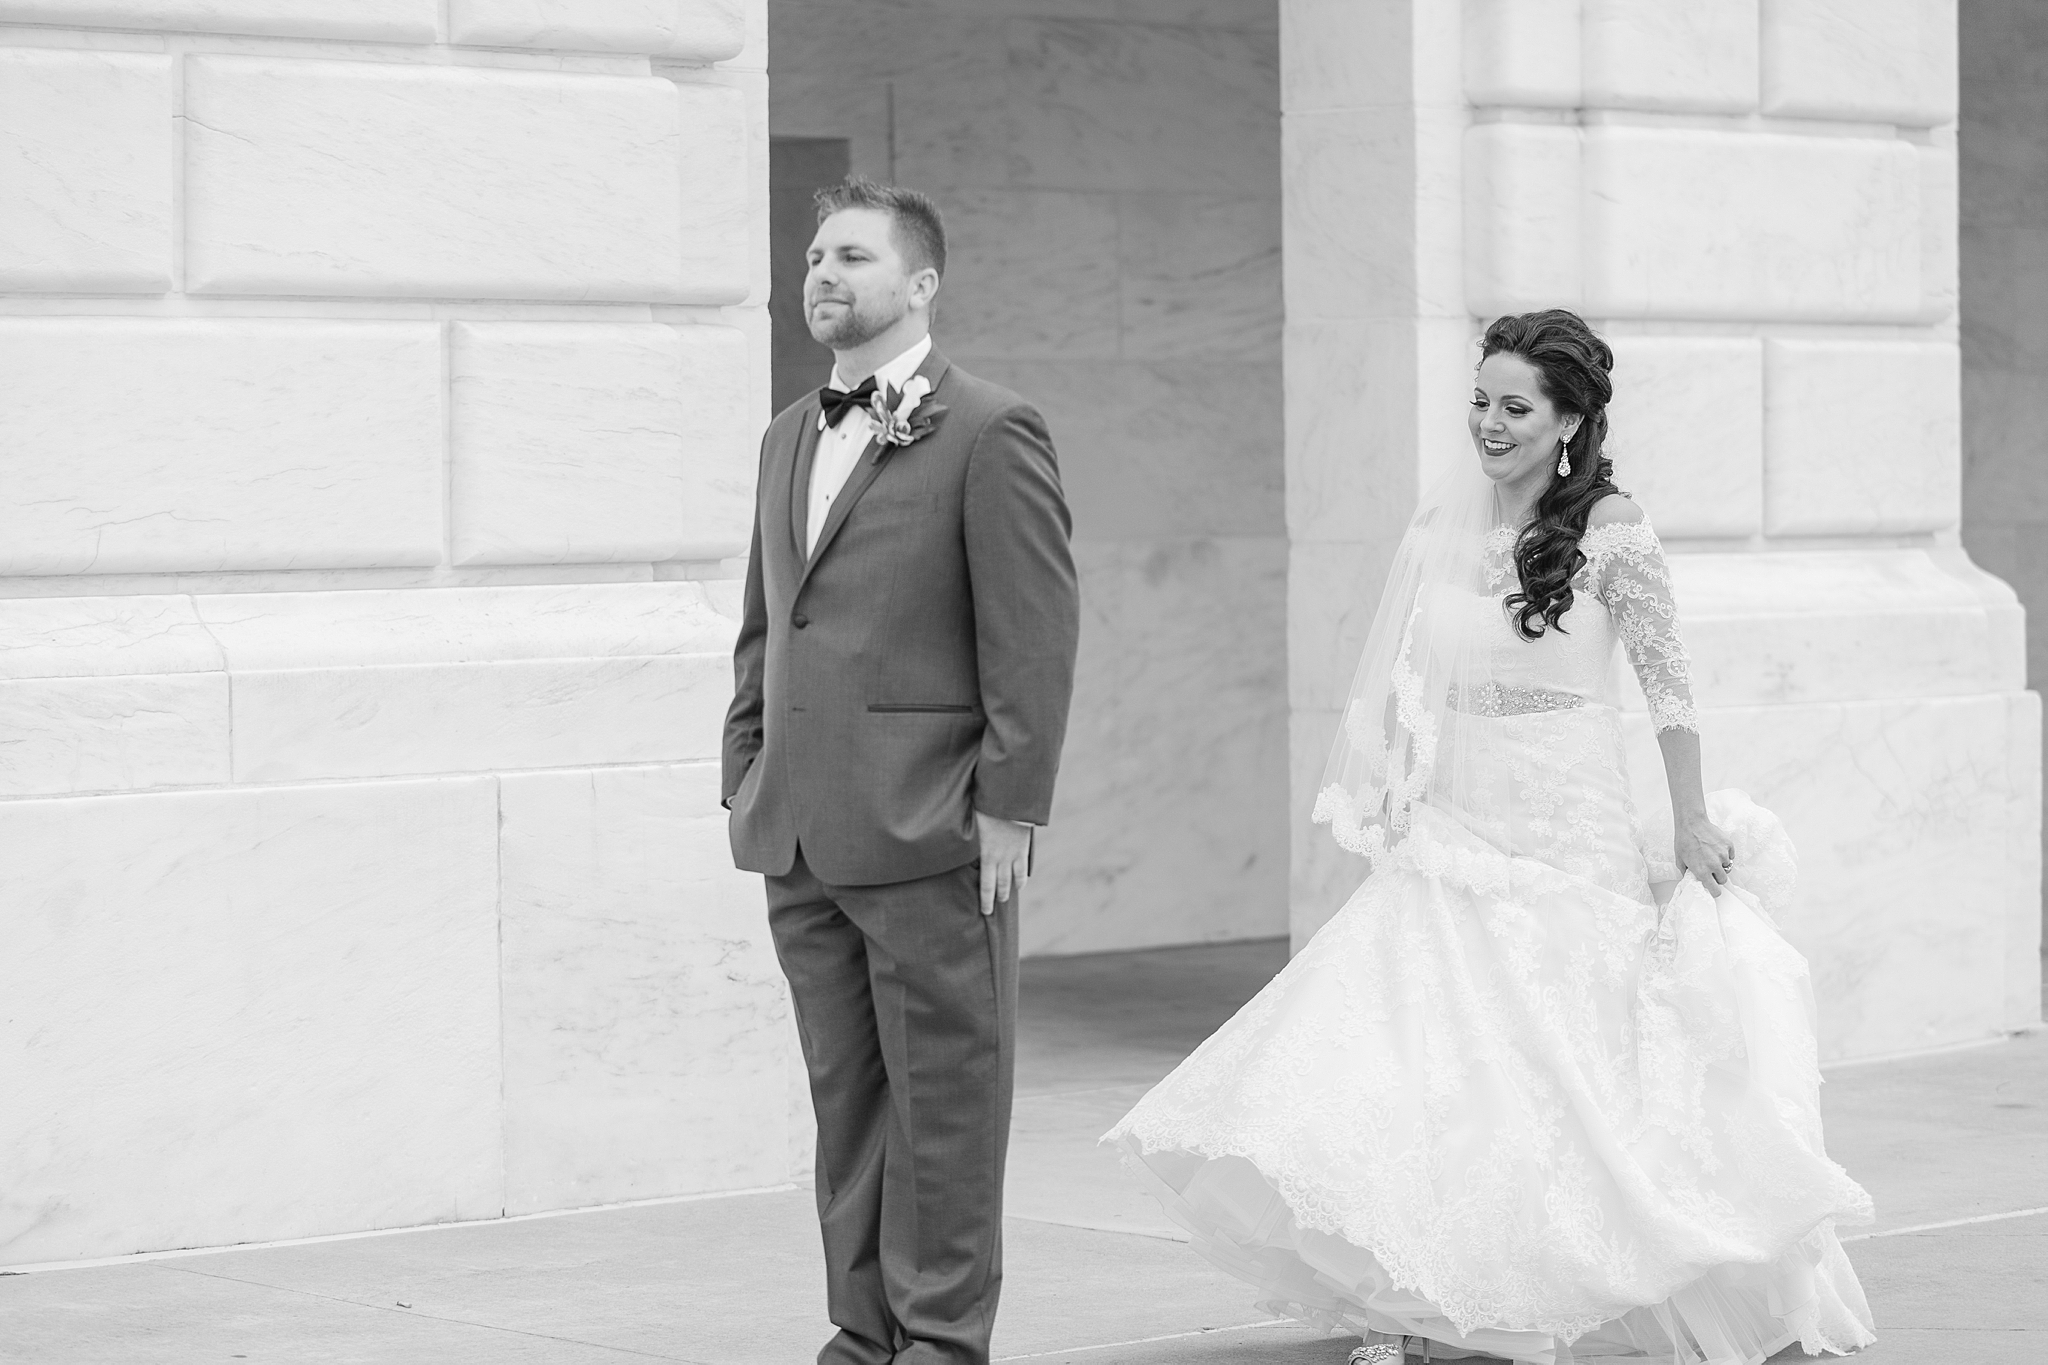 detroit-colony-club-wedding-regal-romantic-photography-in-detroit-mi-by-courtney-carolyn-photography_0010.jpg